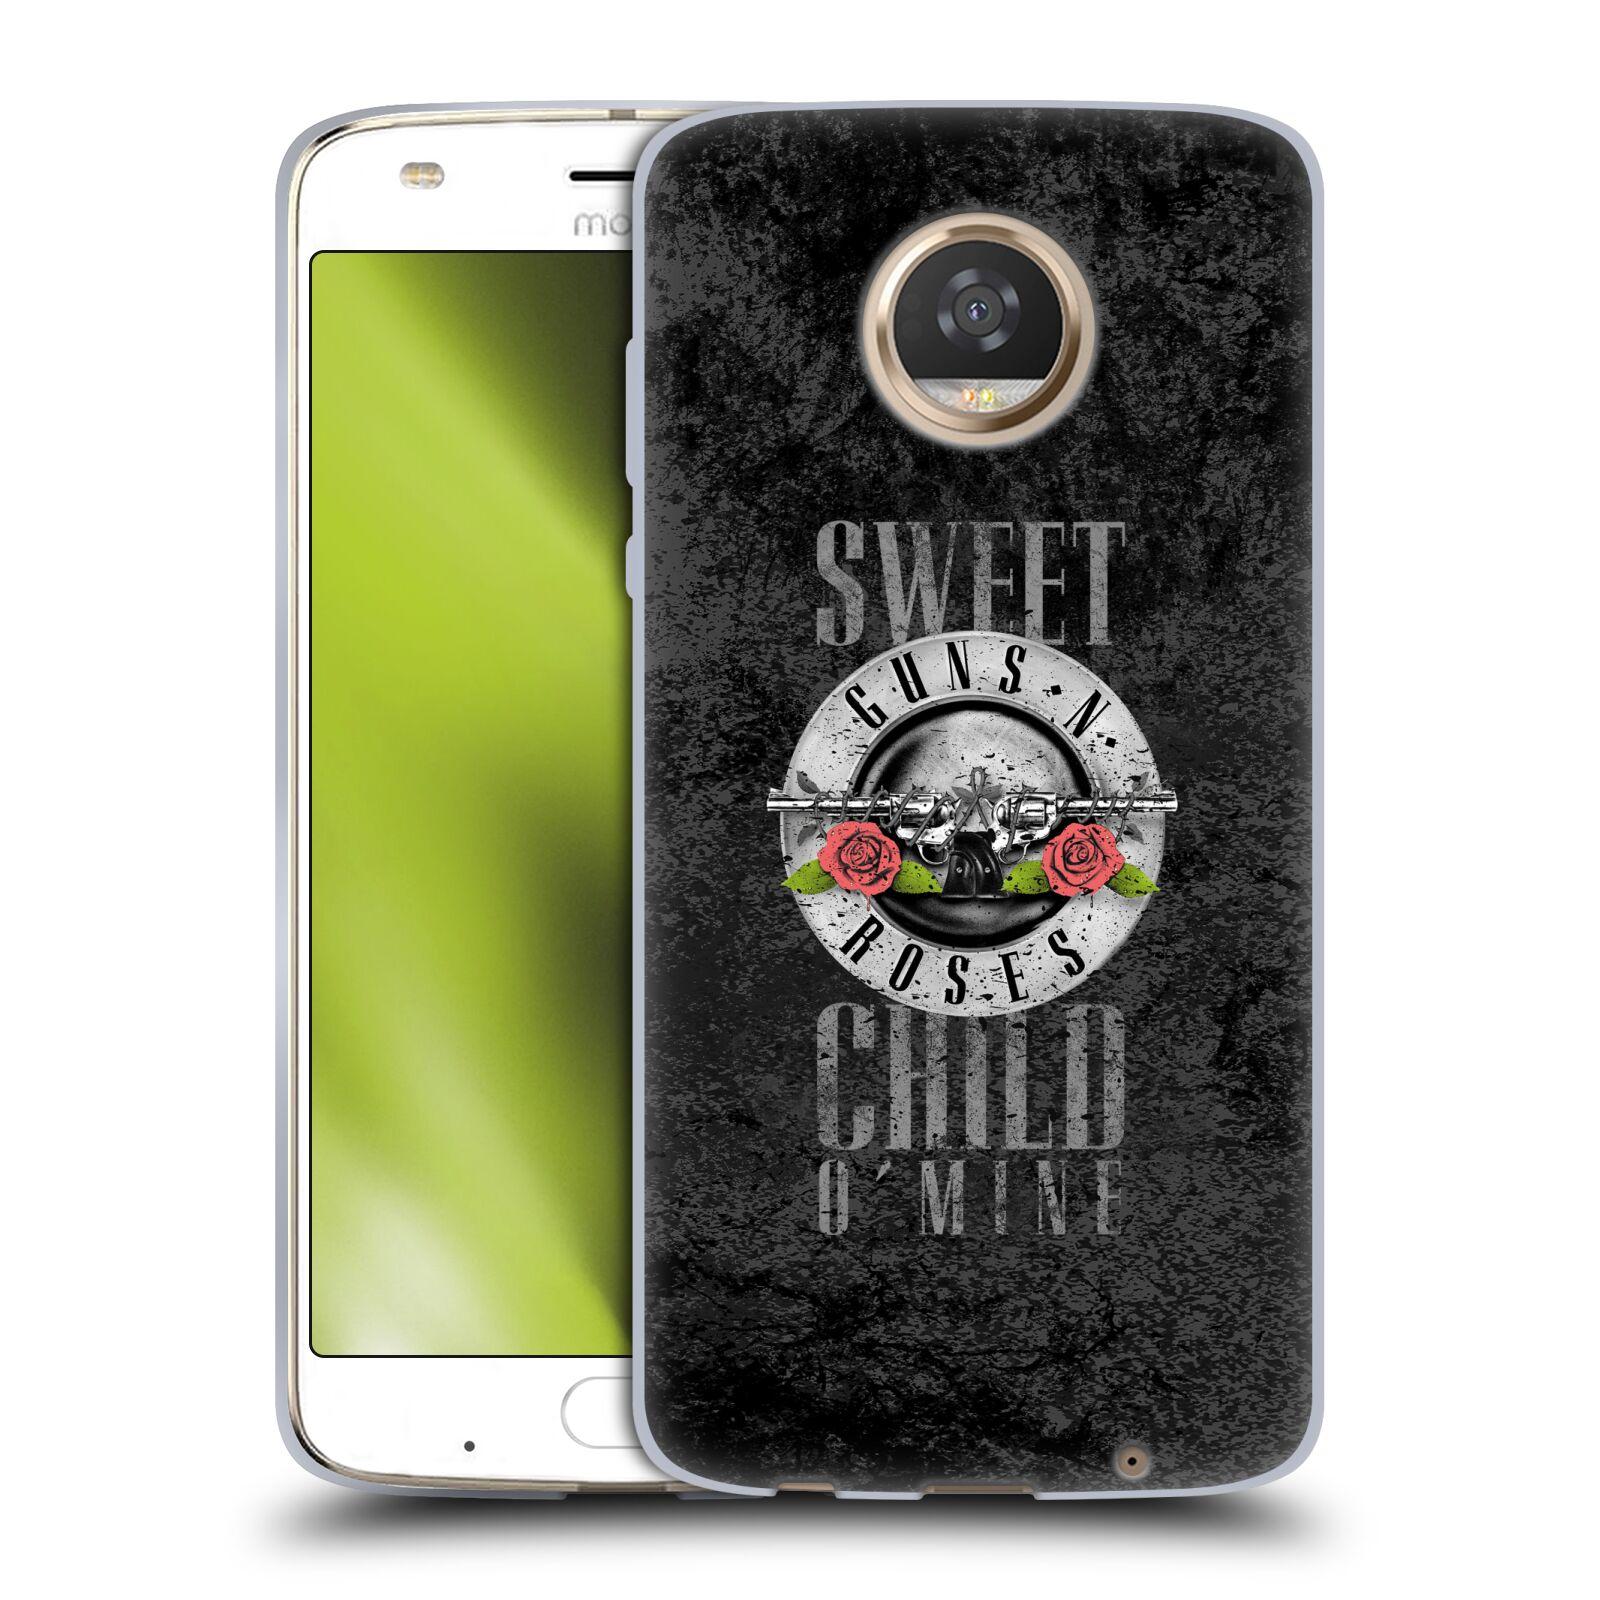 Silikonové pouzdro na mobil Lenovo Moto Z2 Play - Head Case - Guns N' Roses - Sweet Child